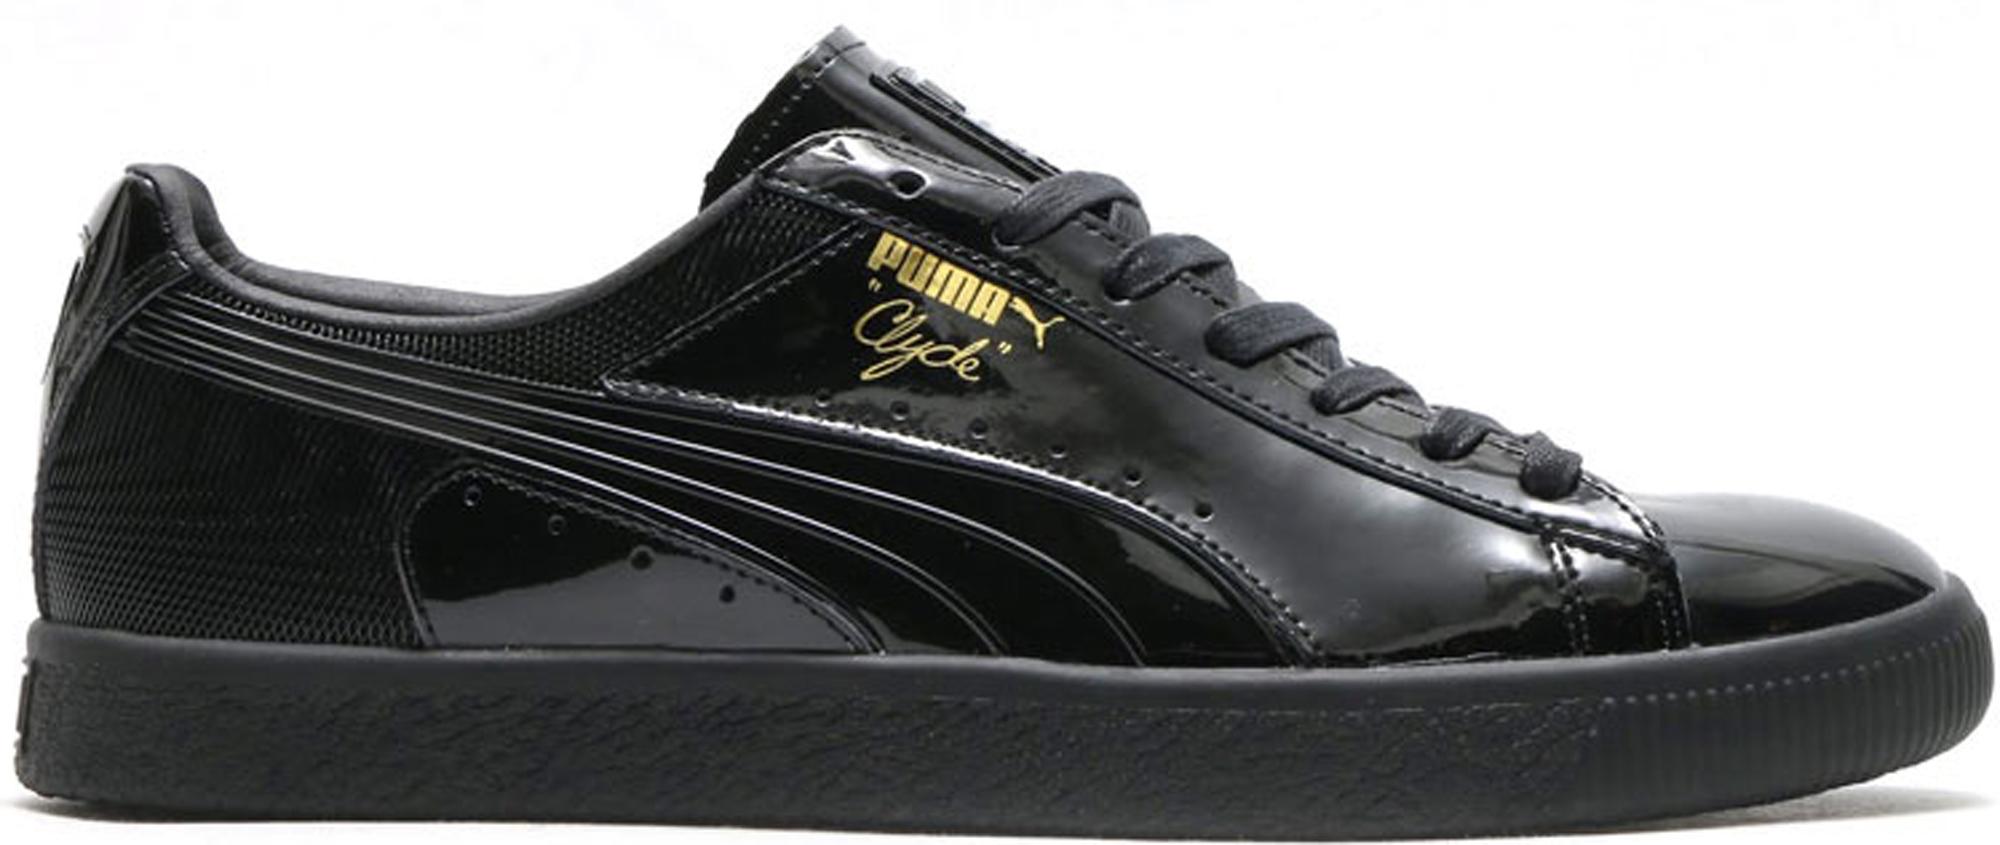 Puma Clyde Wraith Black - 363512-01